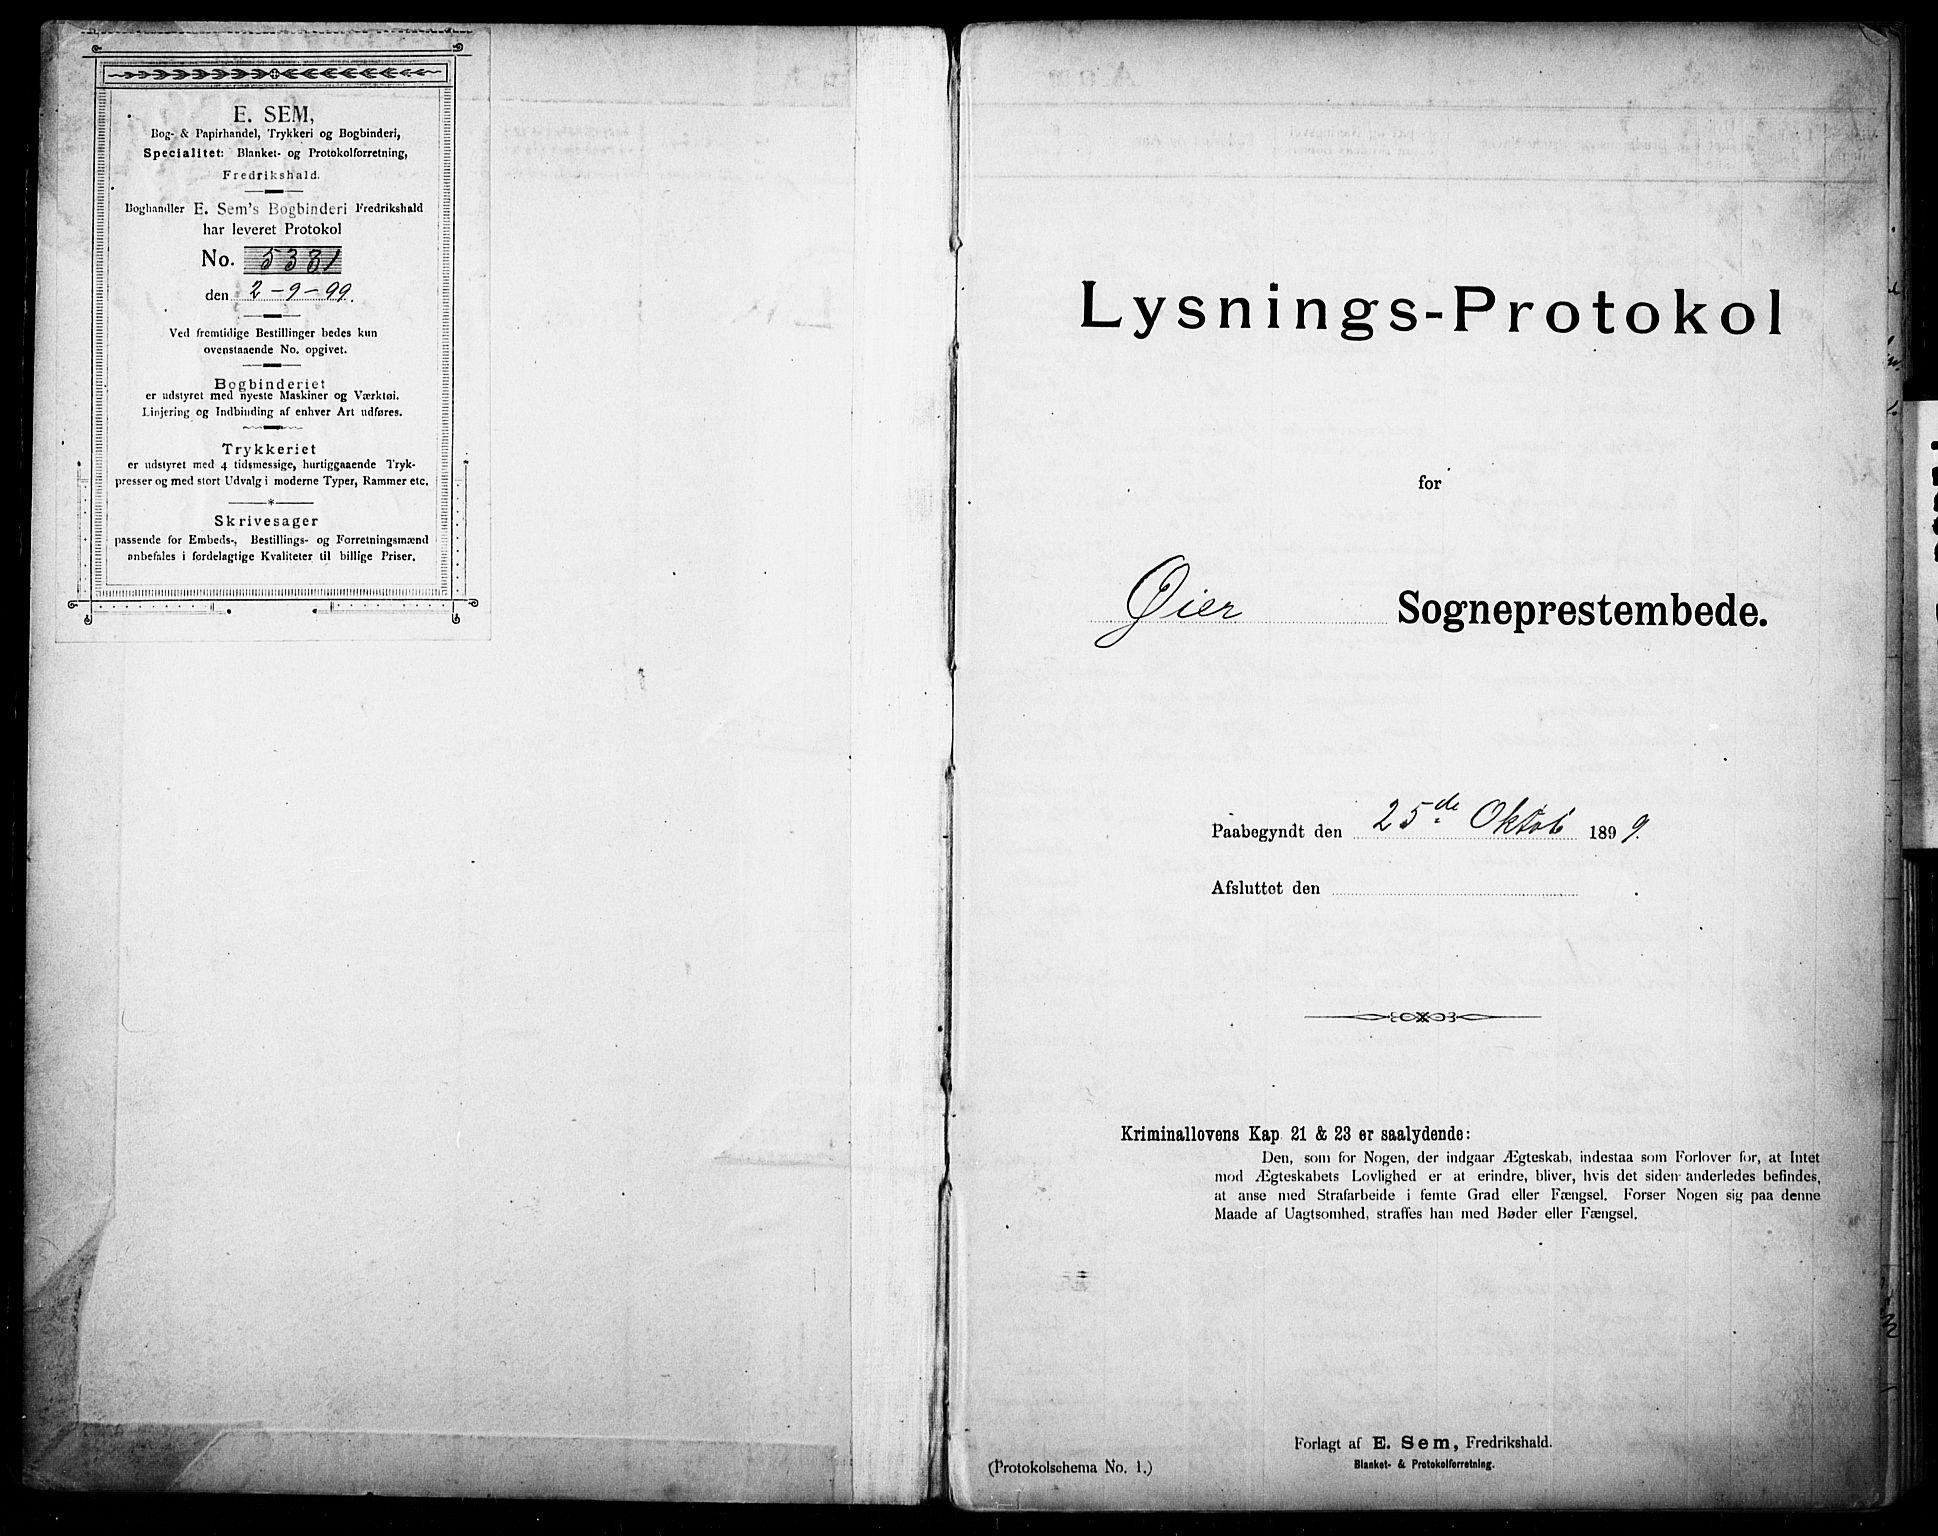 SAH, Øyer prestekontor, Lysningsprotokoll nr. 1, 1899-1928